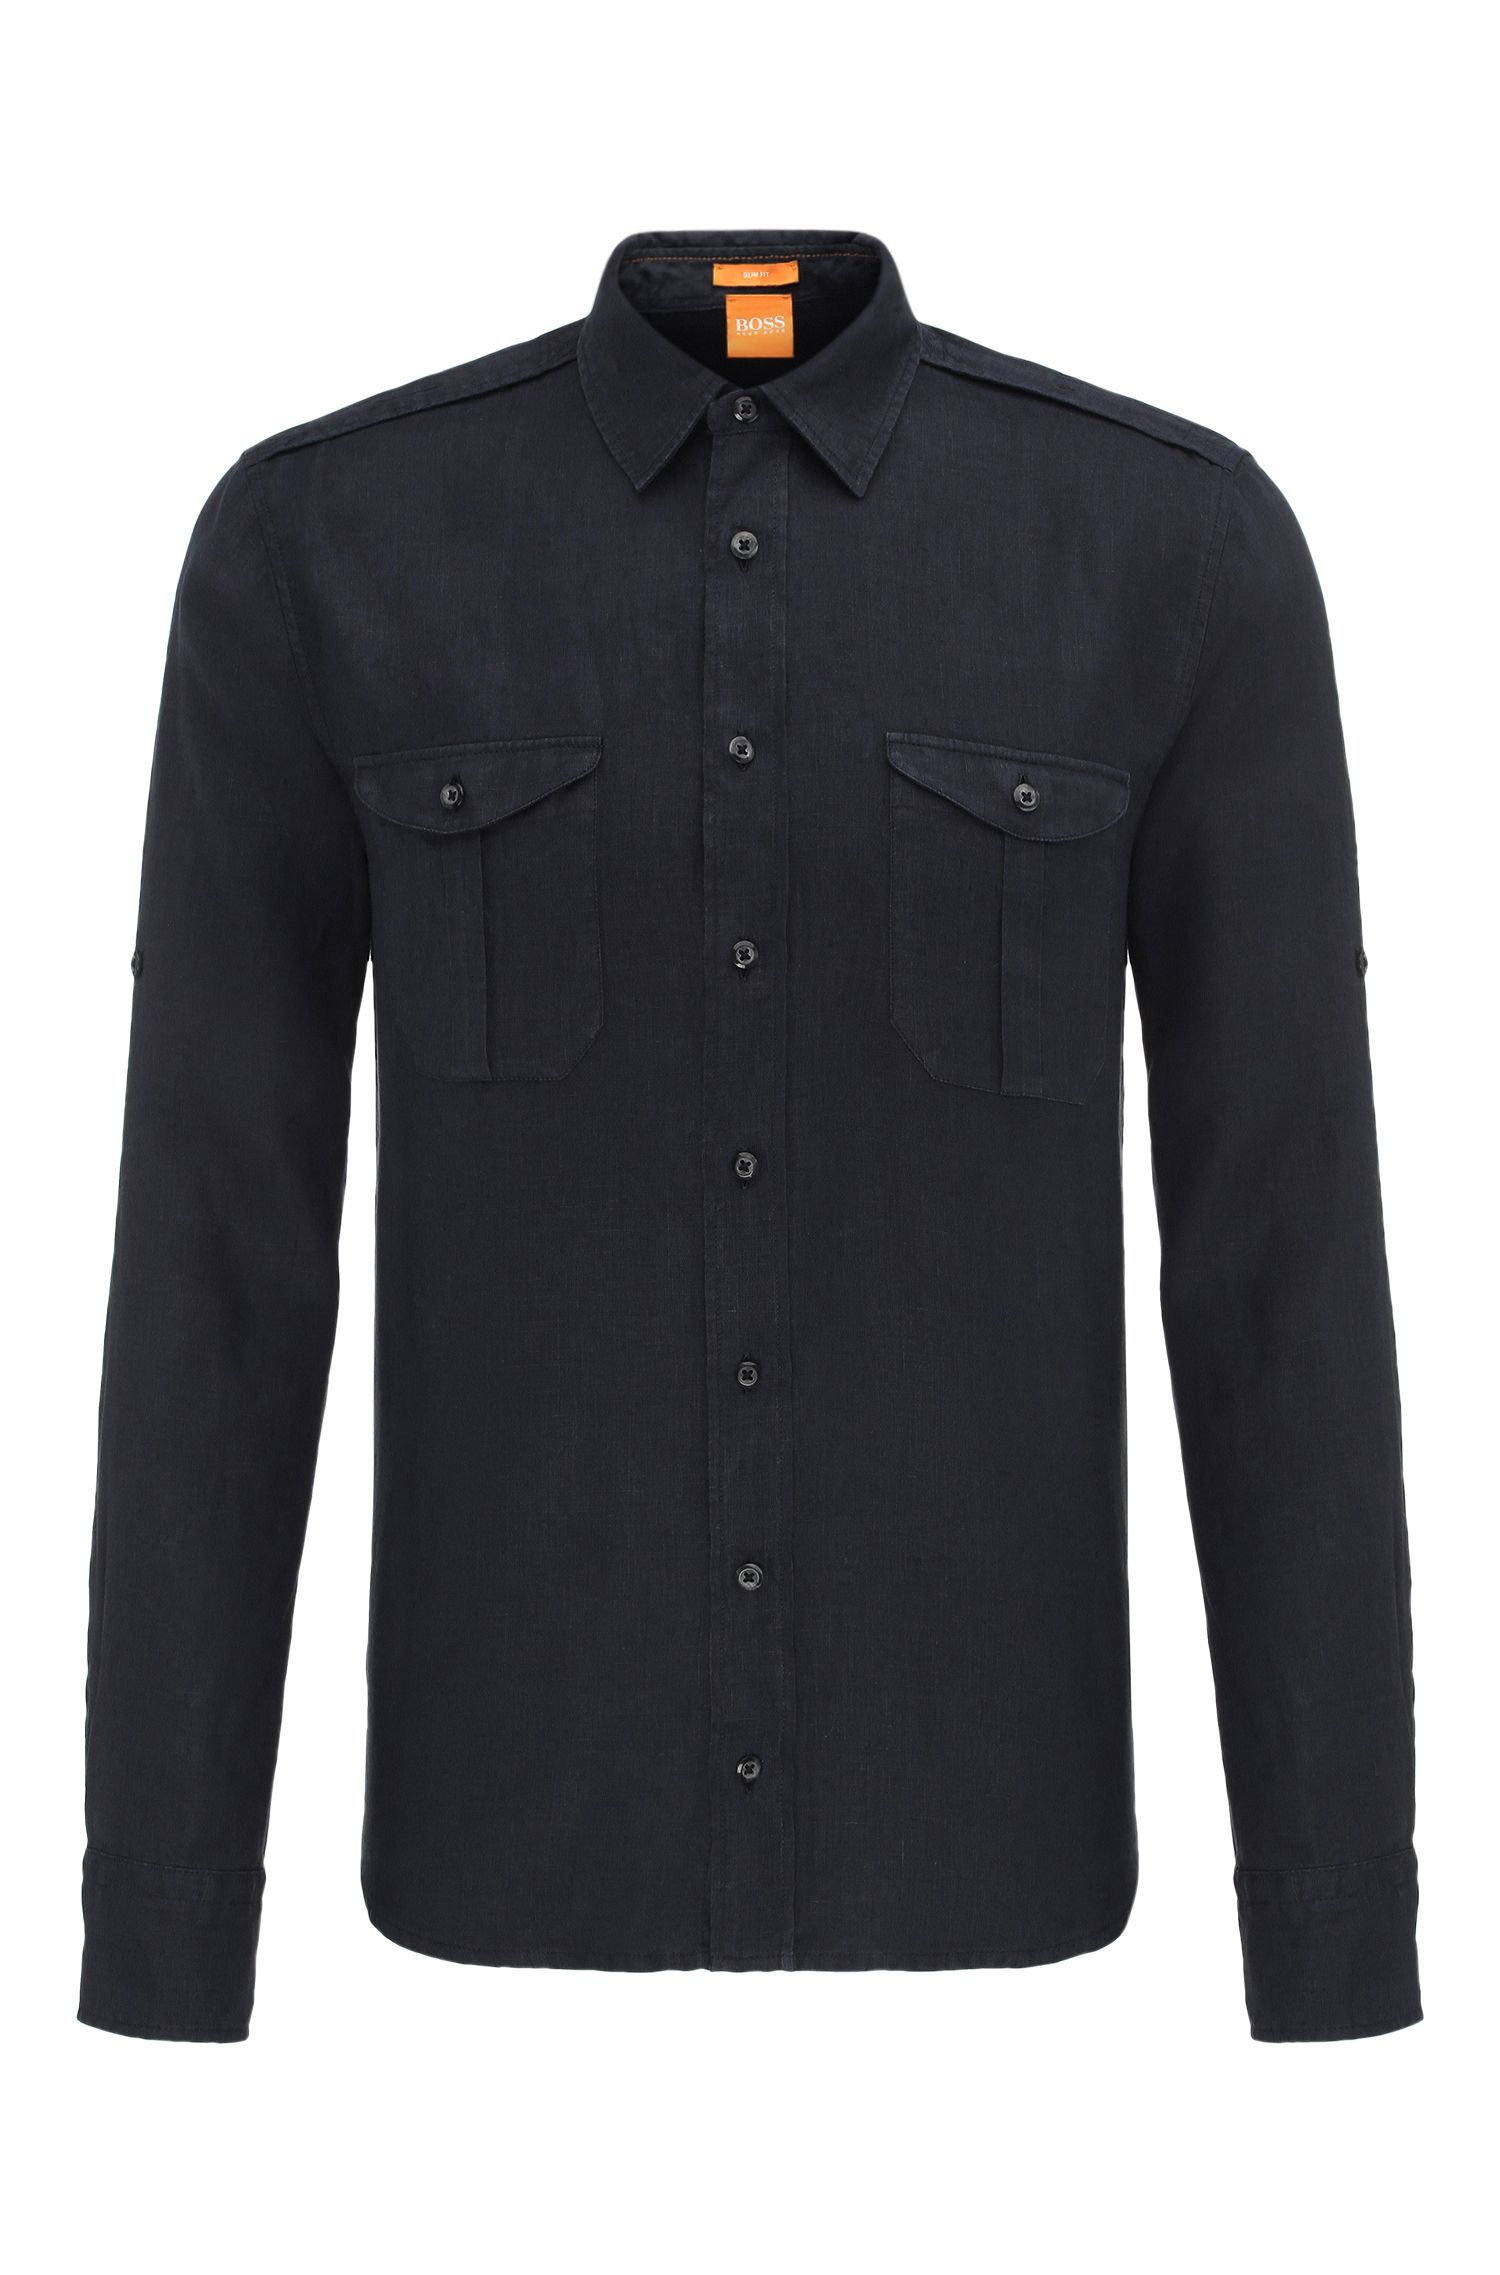 'Cadetto' | Slim Fit, Cotton Button Down Shirt